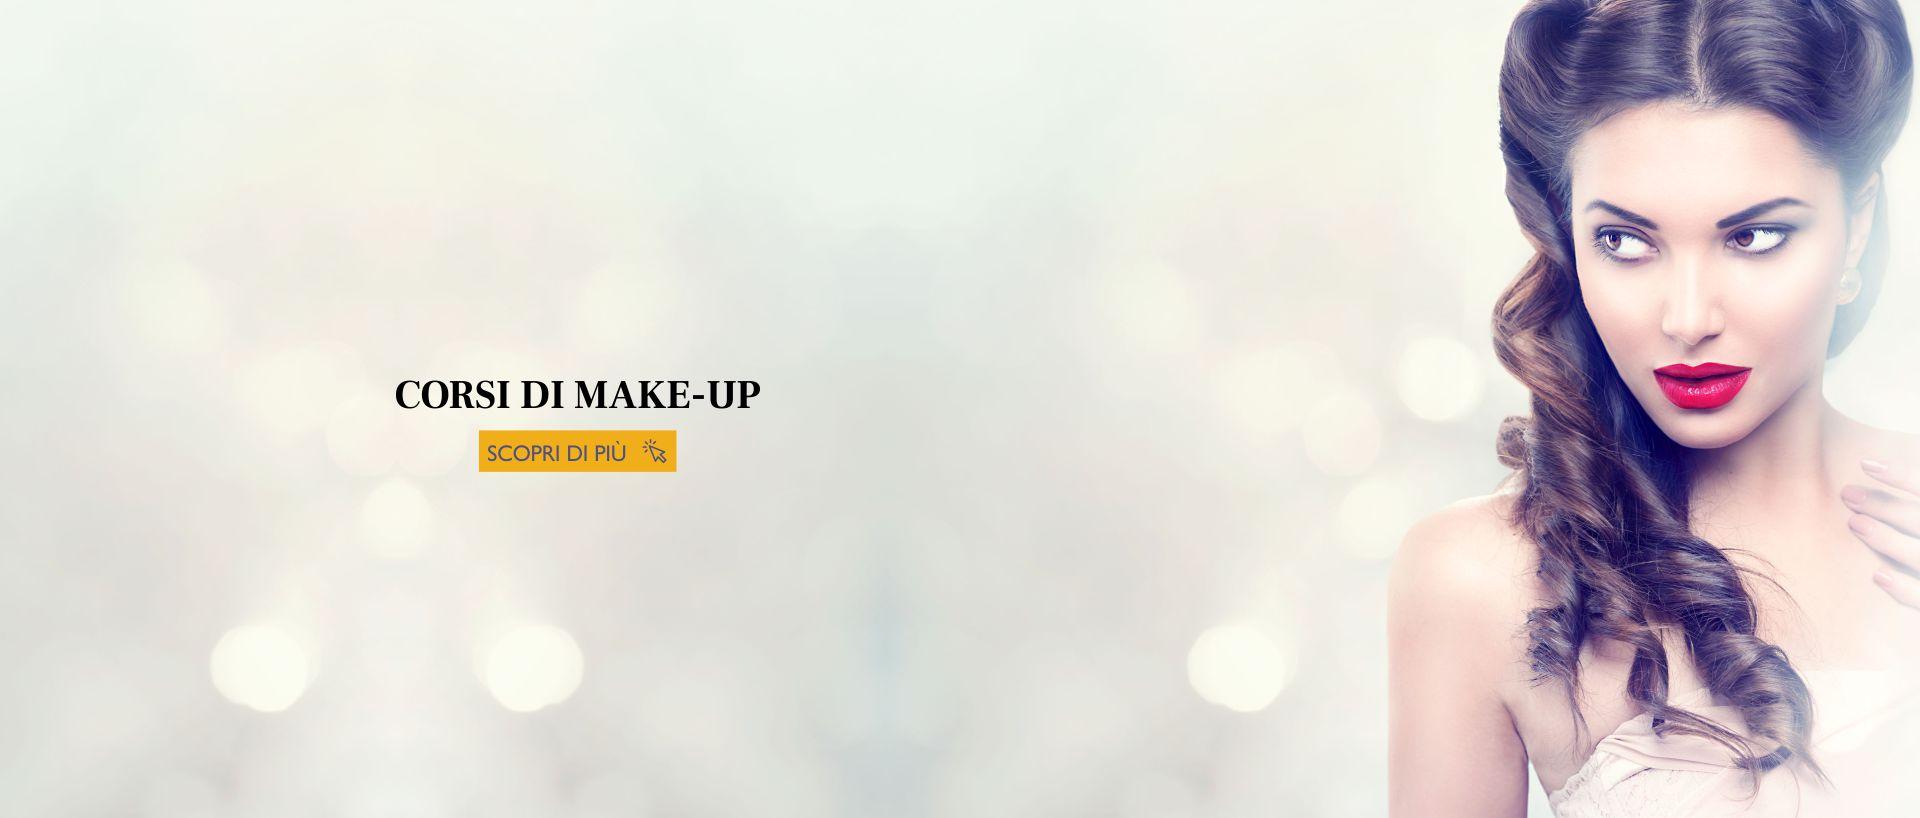 Corsi di Make-Up Bari